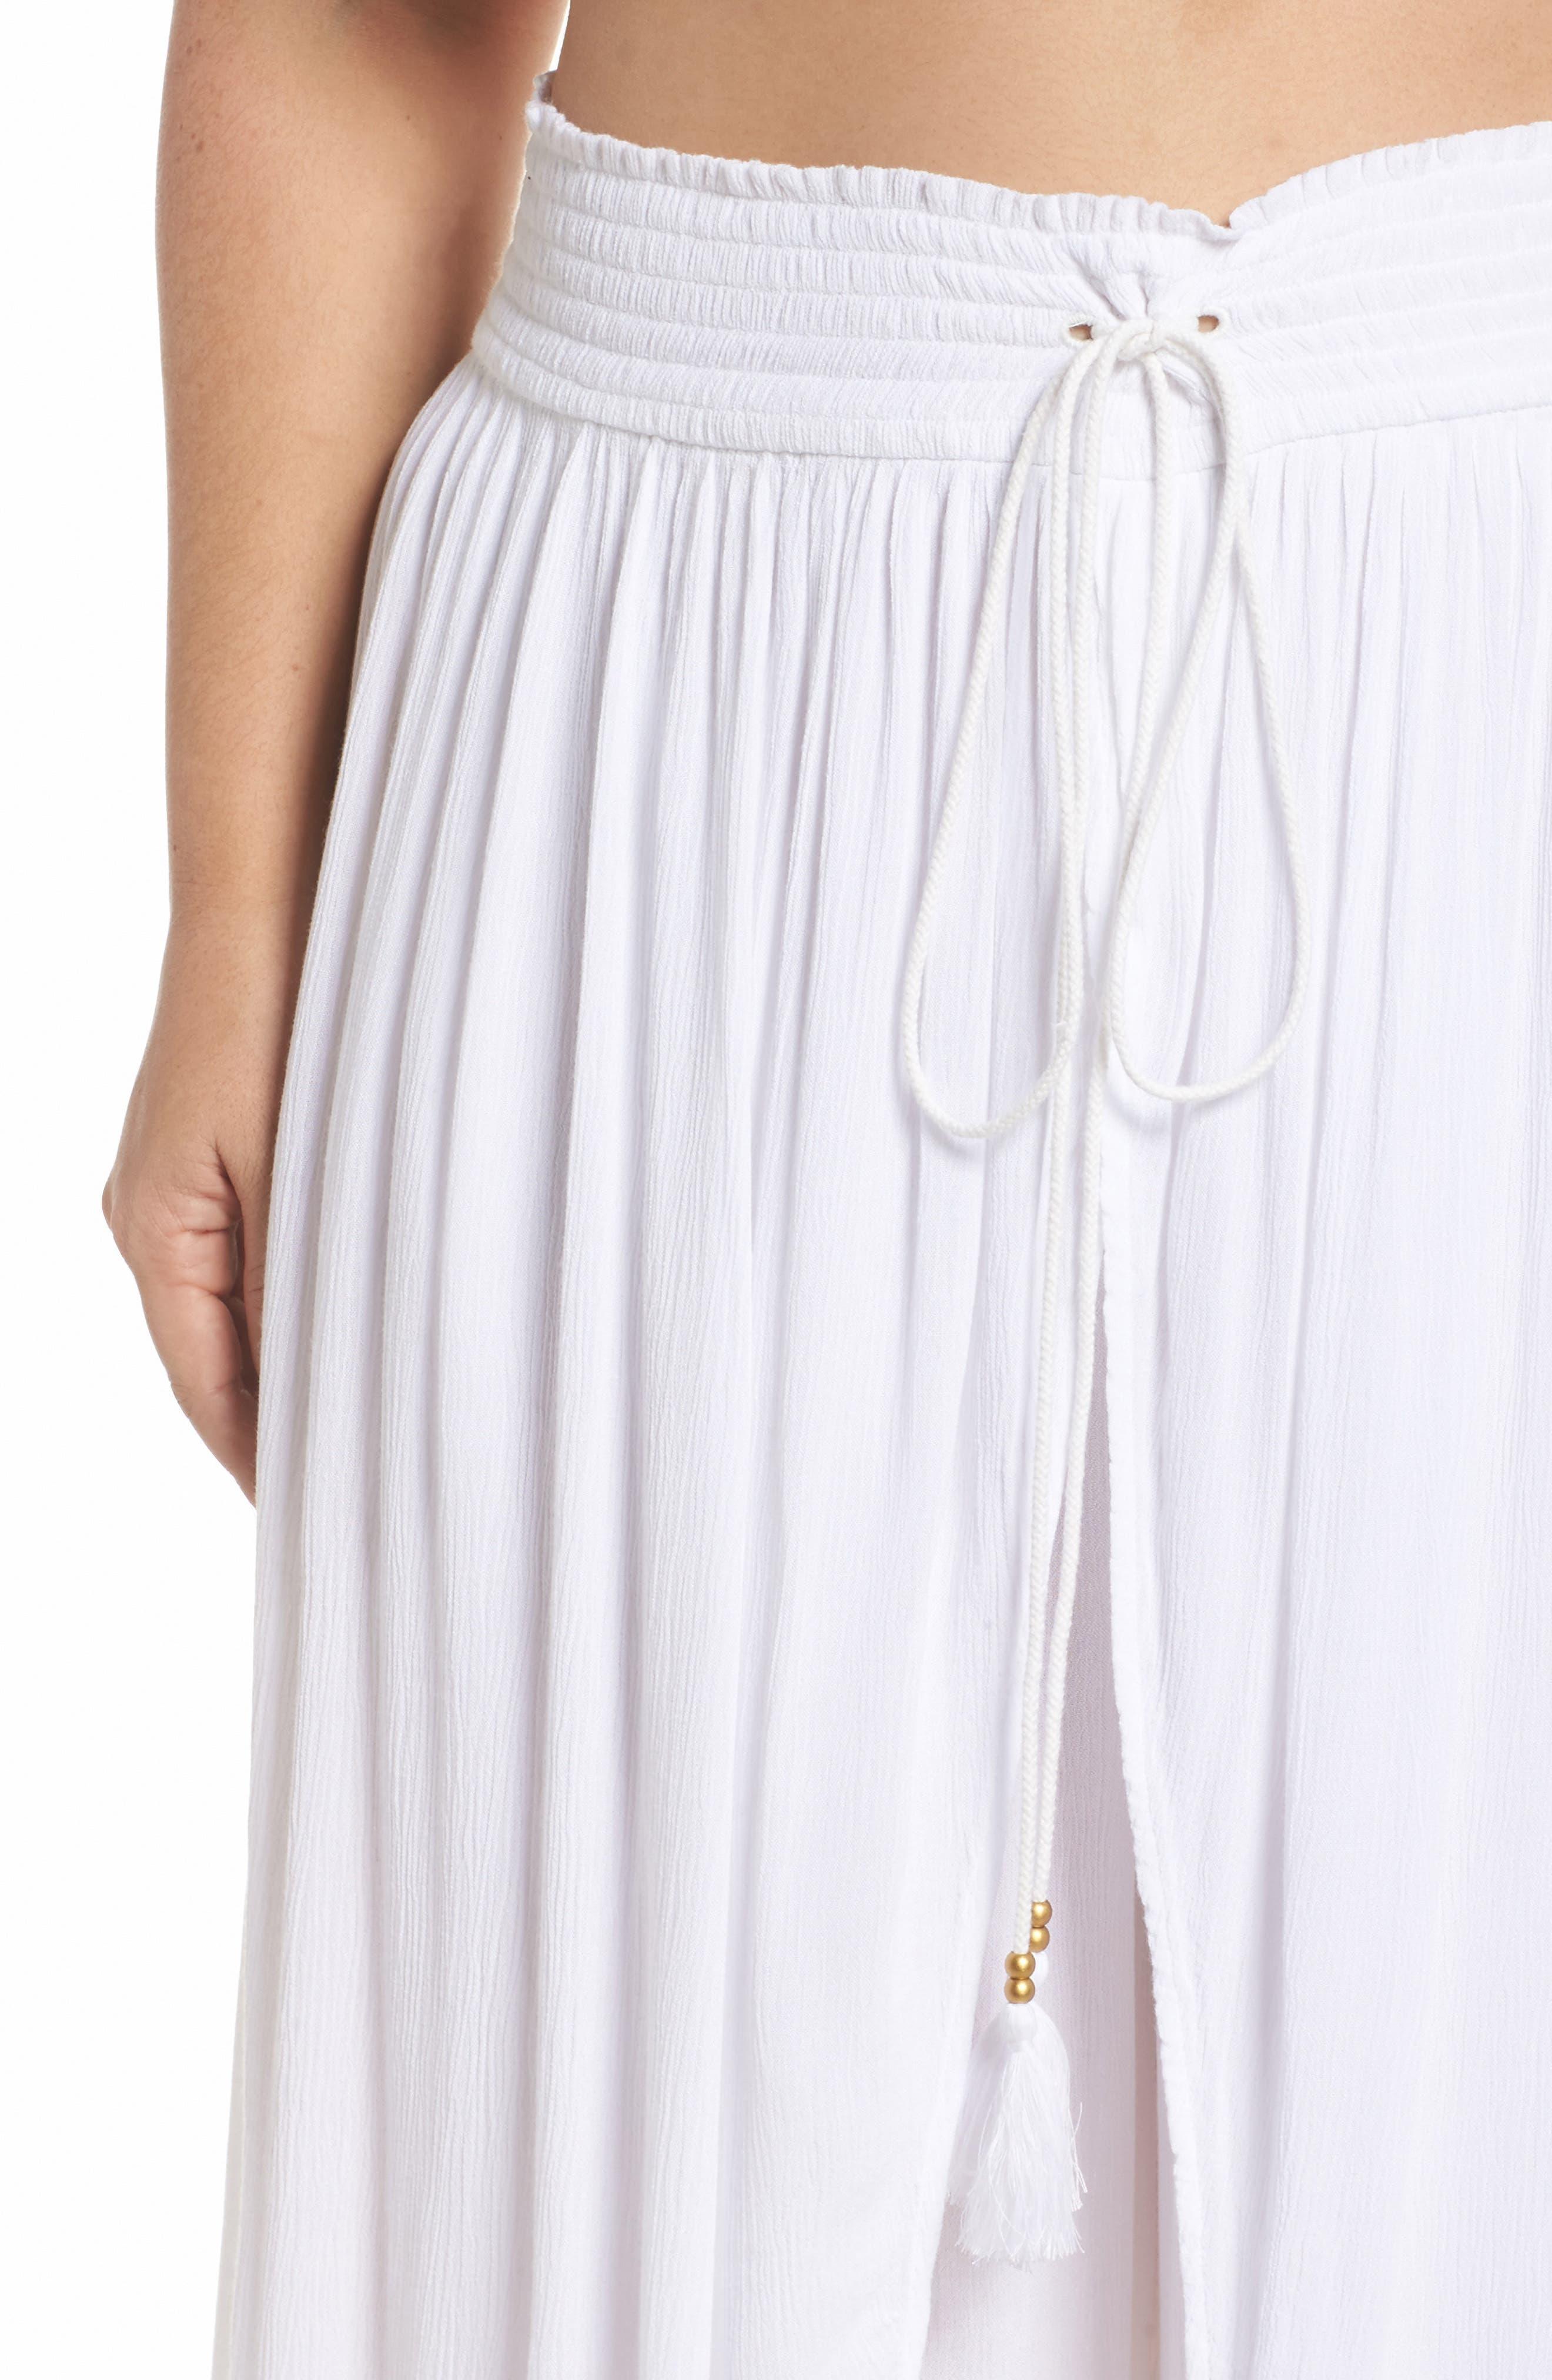 Gauze Cover-Up Pants,                             Alternate thumbnail 4, color,                             White